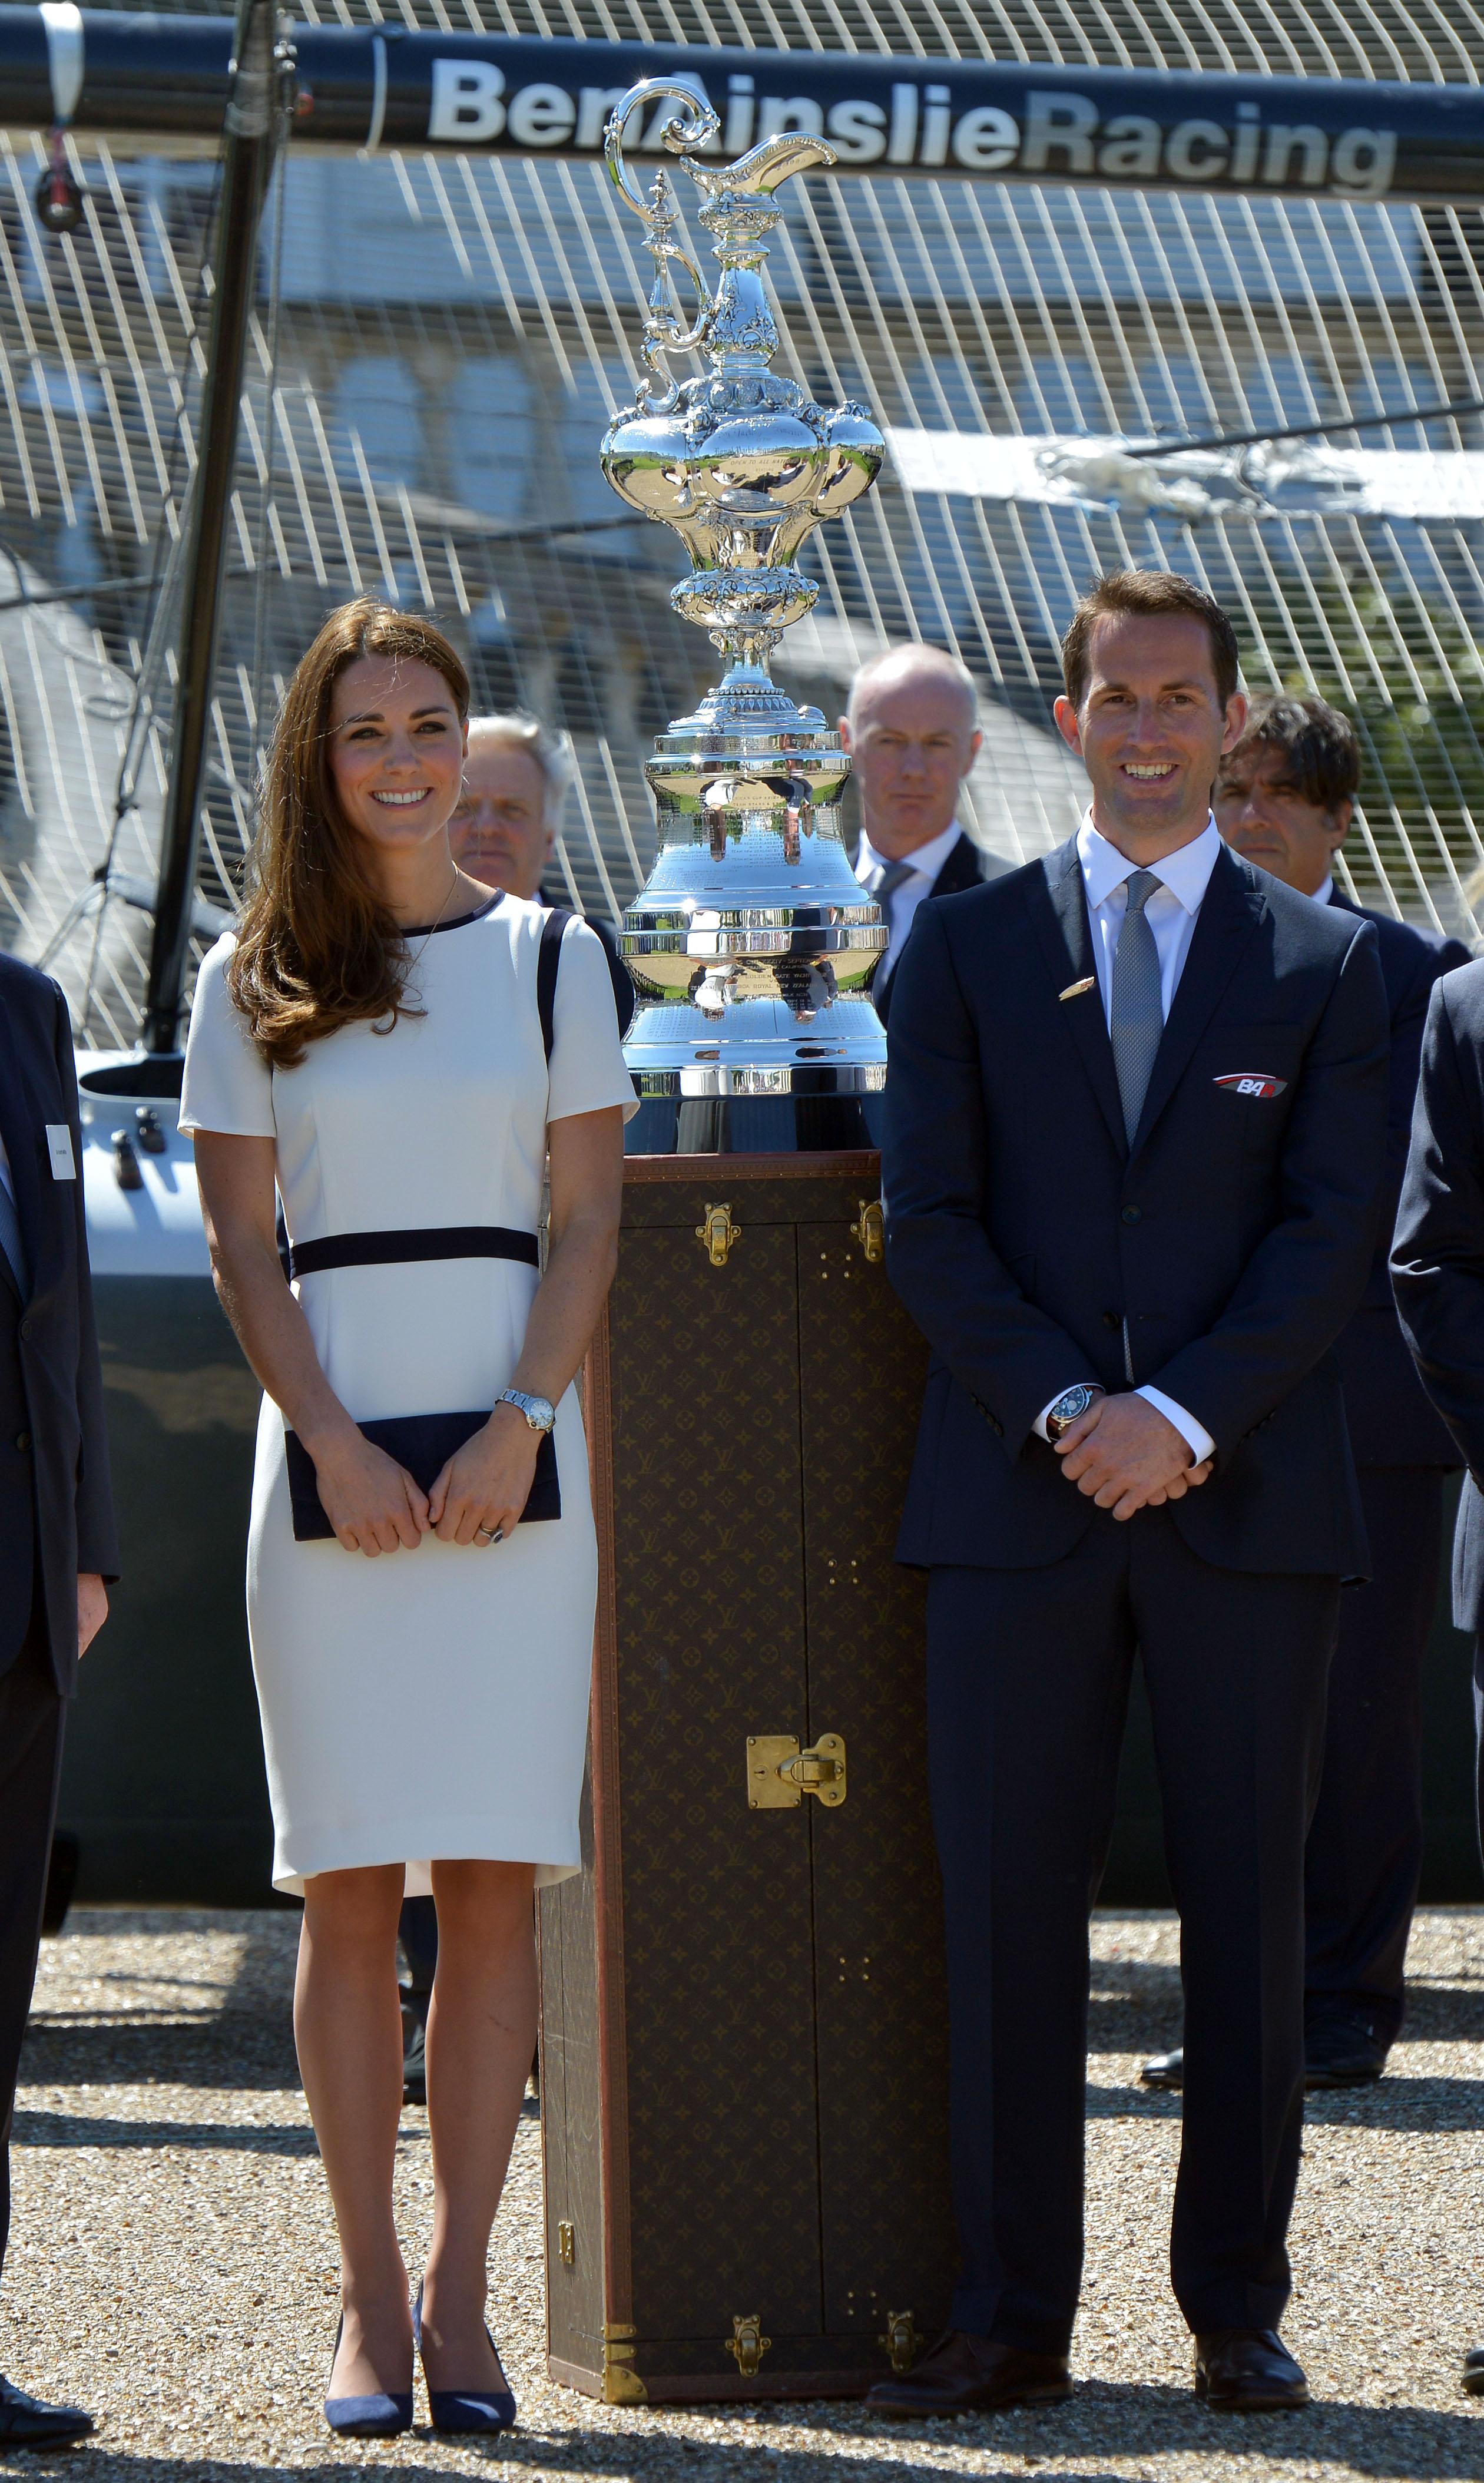 Duchess of Cambridge and Ben ainslie